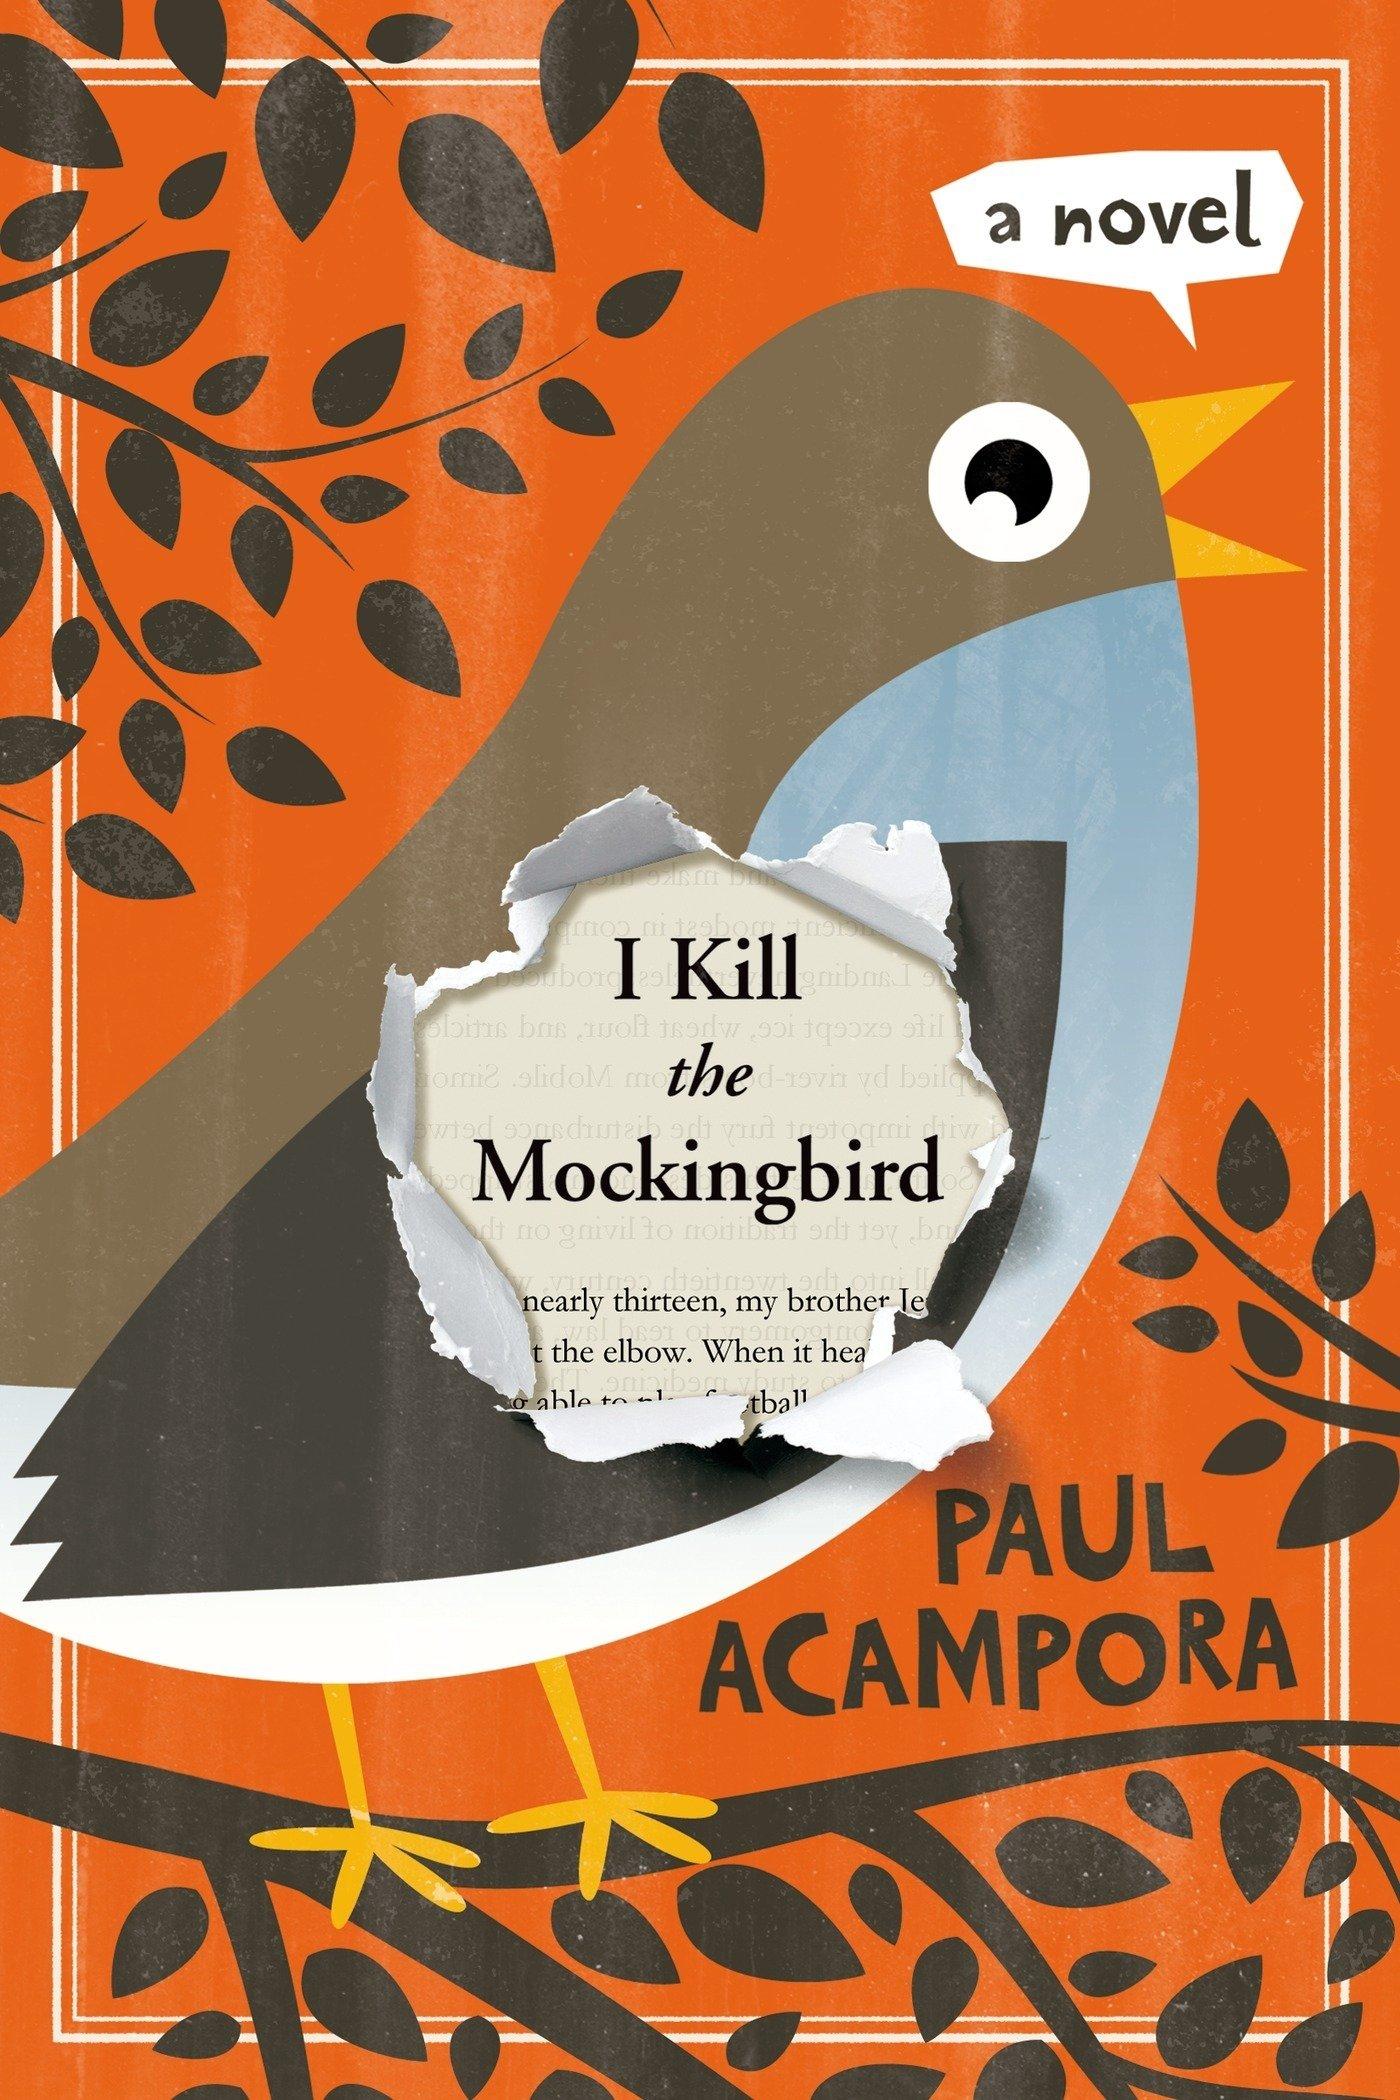 I Kill the Mockingbird: Paul Acampora: 9781250068088: Amazon com: Books